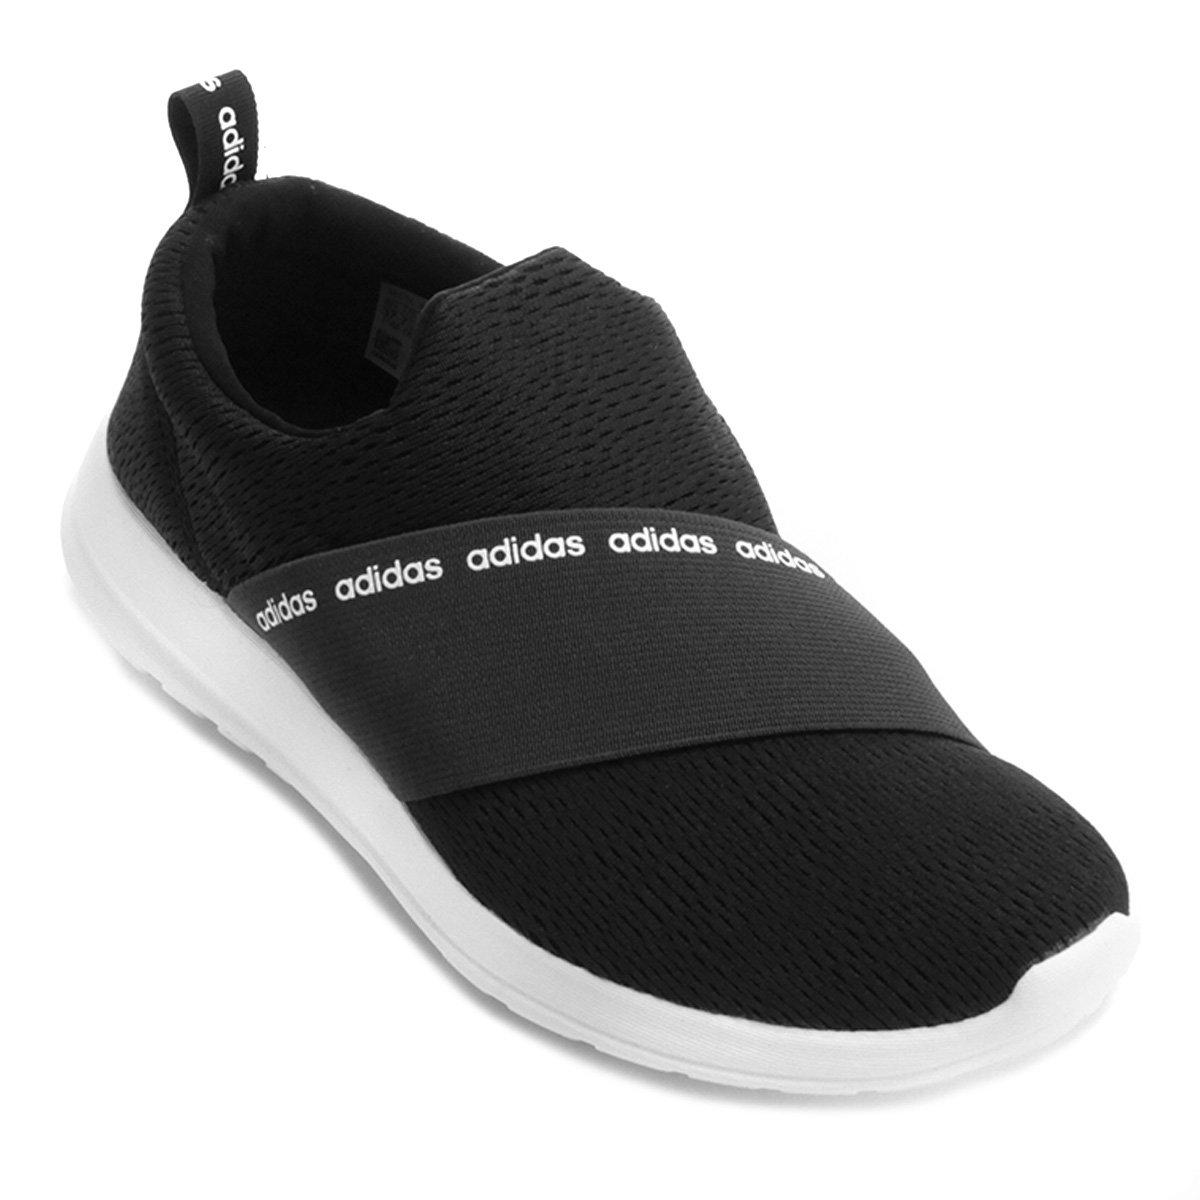 7dbc00b62ed Tênis Adidas Cf Refine Adapt W Feminino - Preto - Compre Agora ...